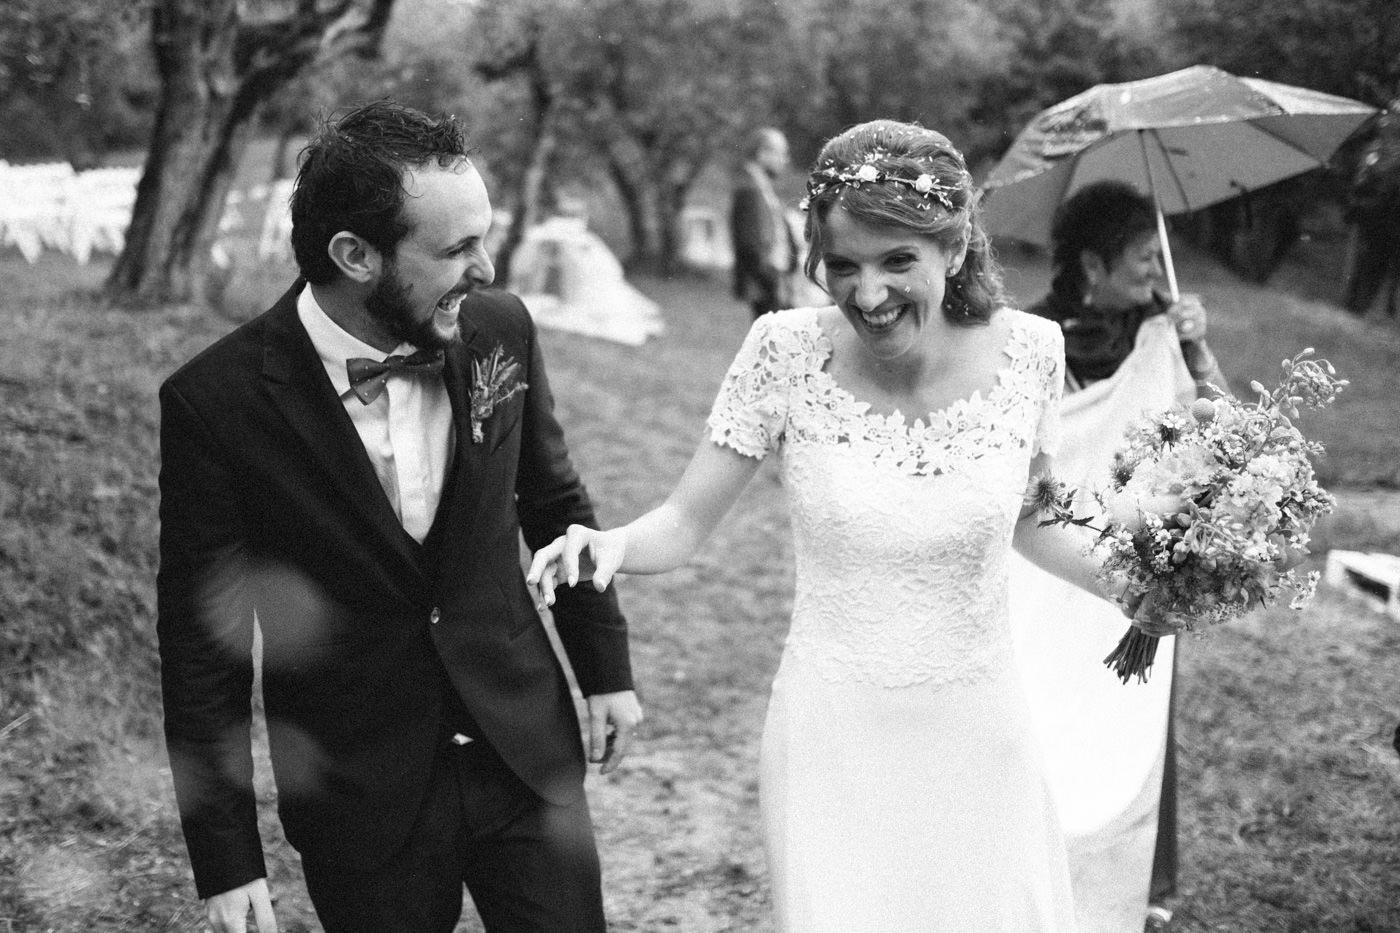 matrimoni_all_italiana_fotografo_matrimonio_toscana-50.jpg